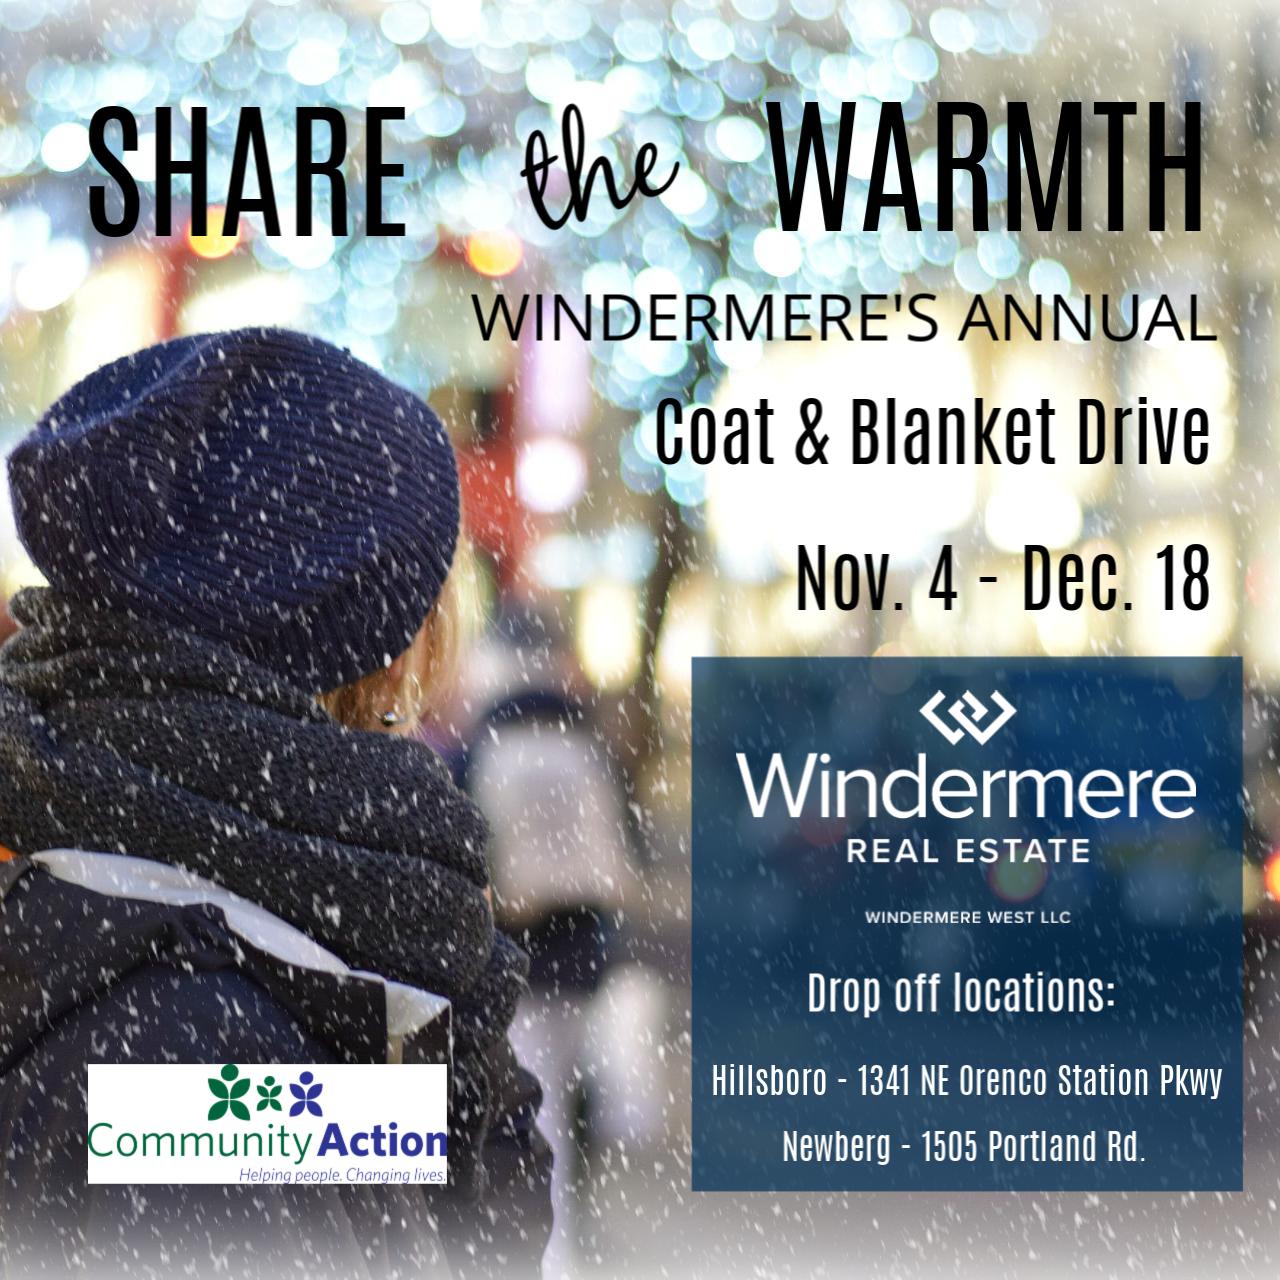 Windermere West's Annual Coat & Blanket Drive